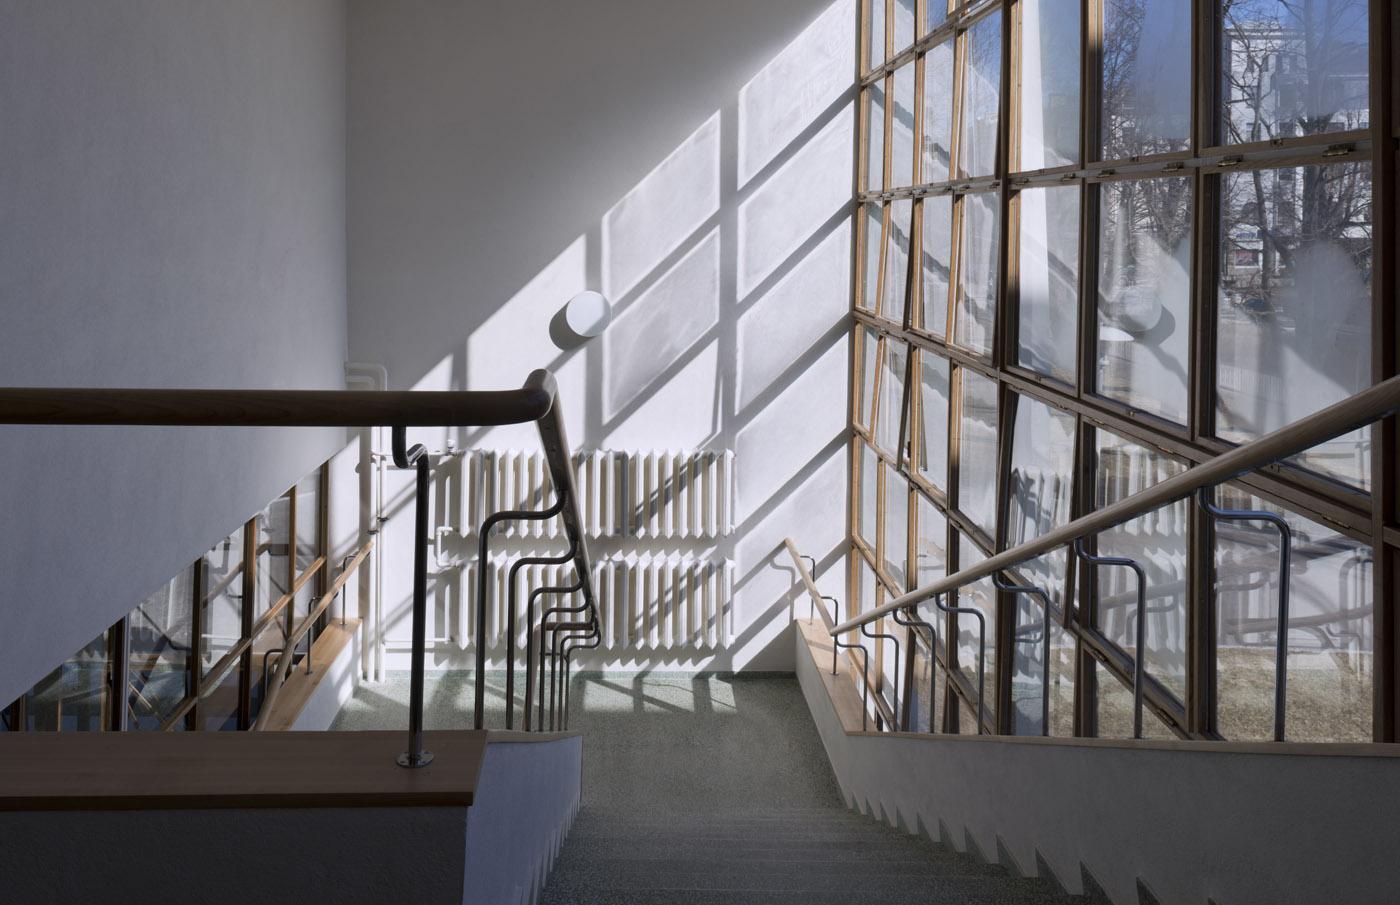 Vyborg library staircase